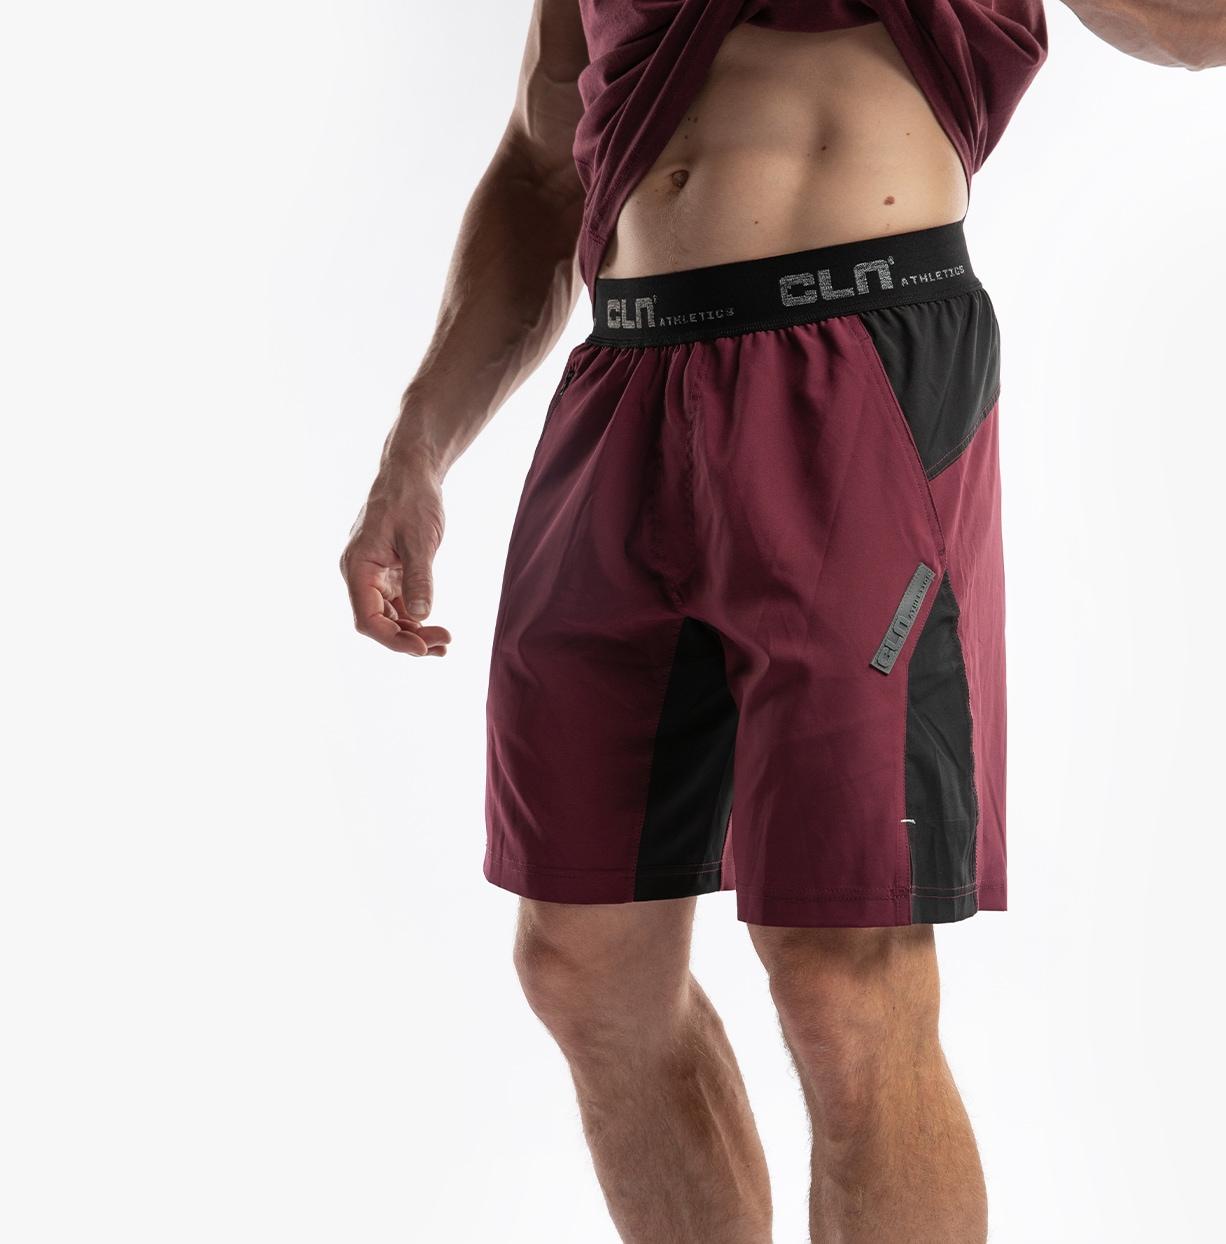 CLN Injection Shorts Burgundy